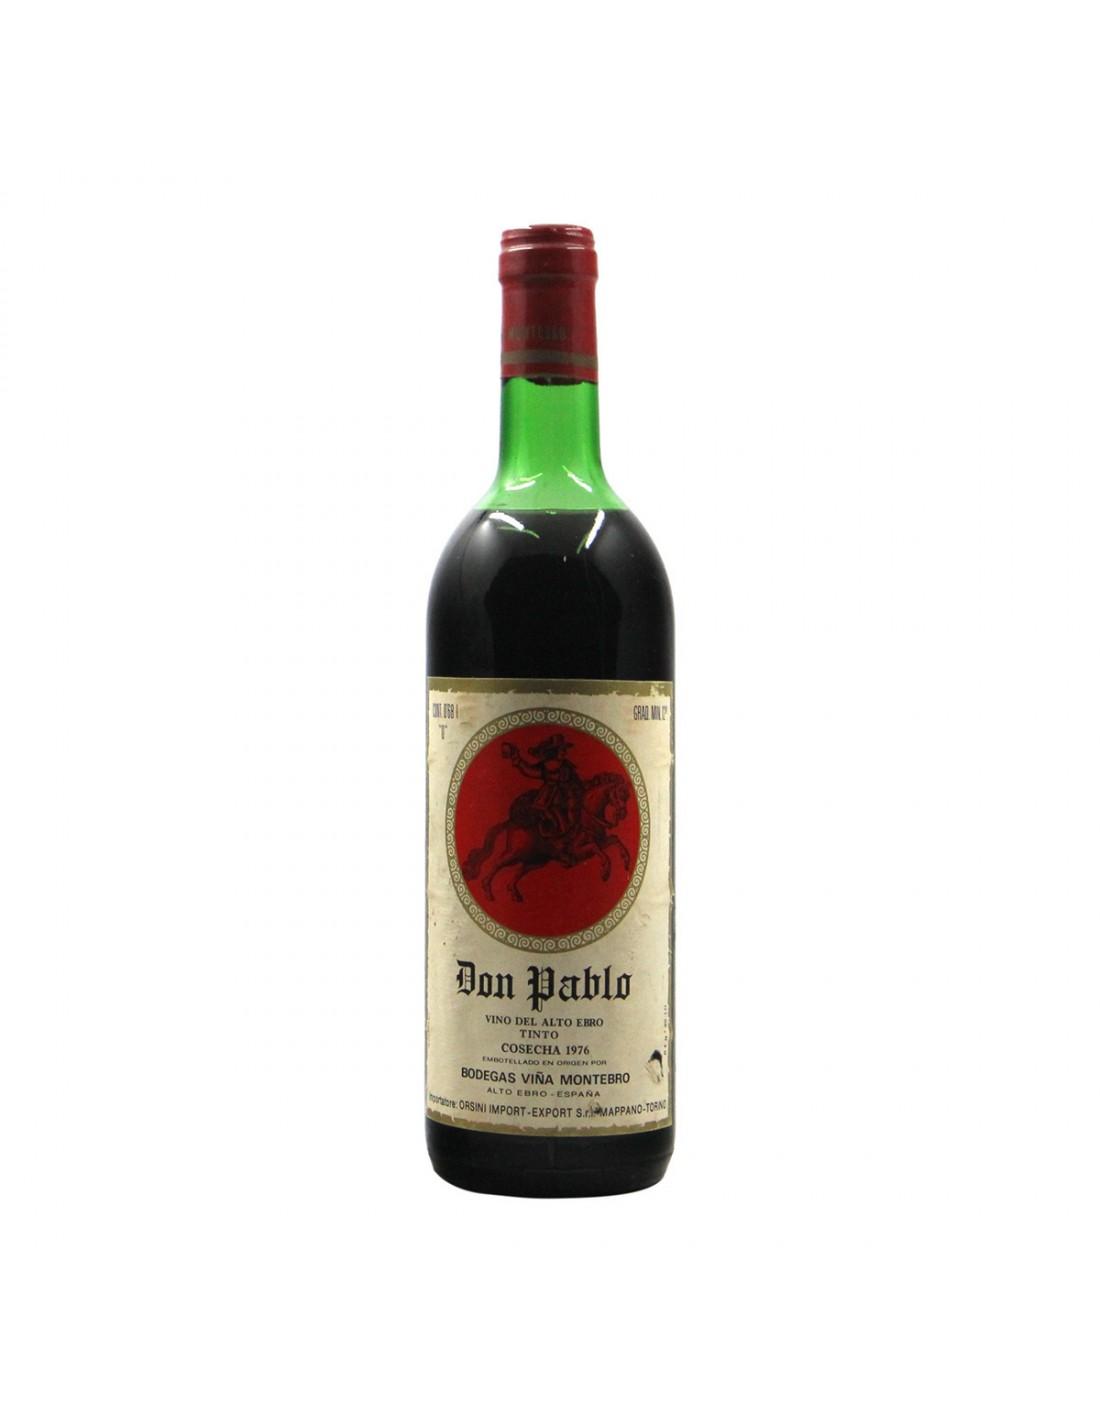 DON PABLO COSECHA 1976 BODEGAS VINA MONTEBRO Grandi Bottiglie